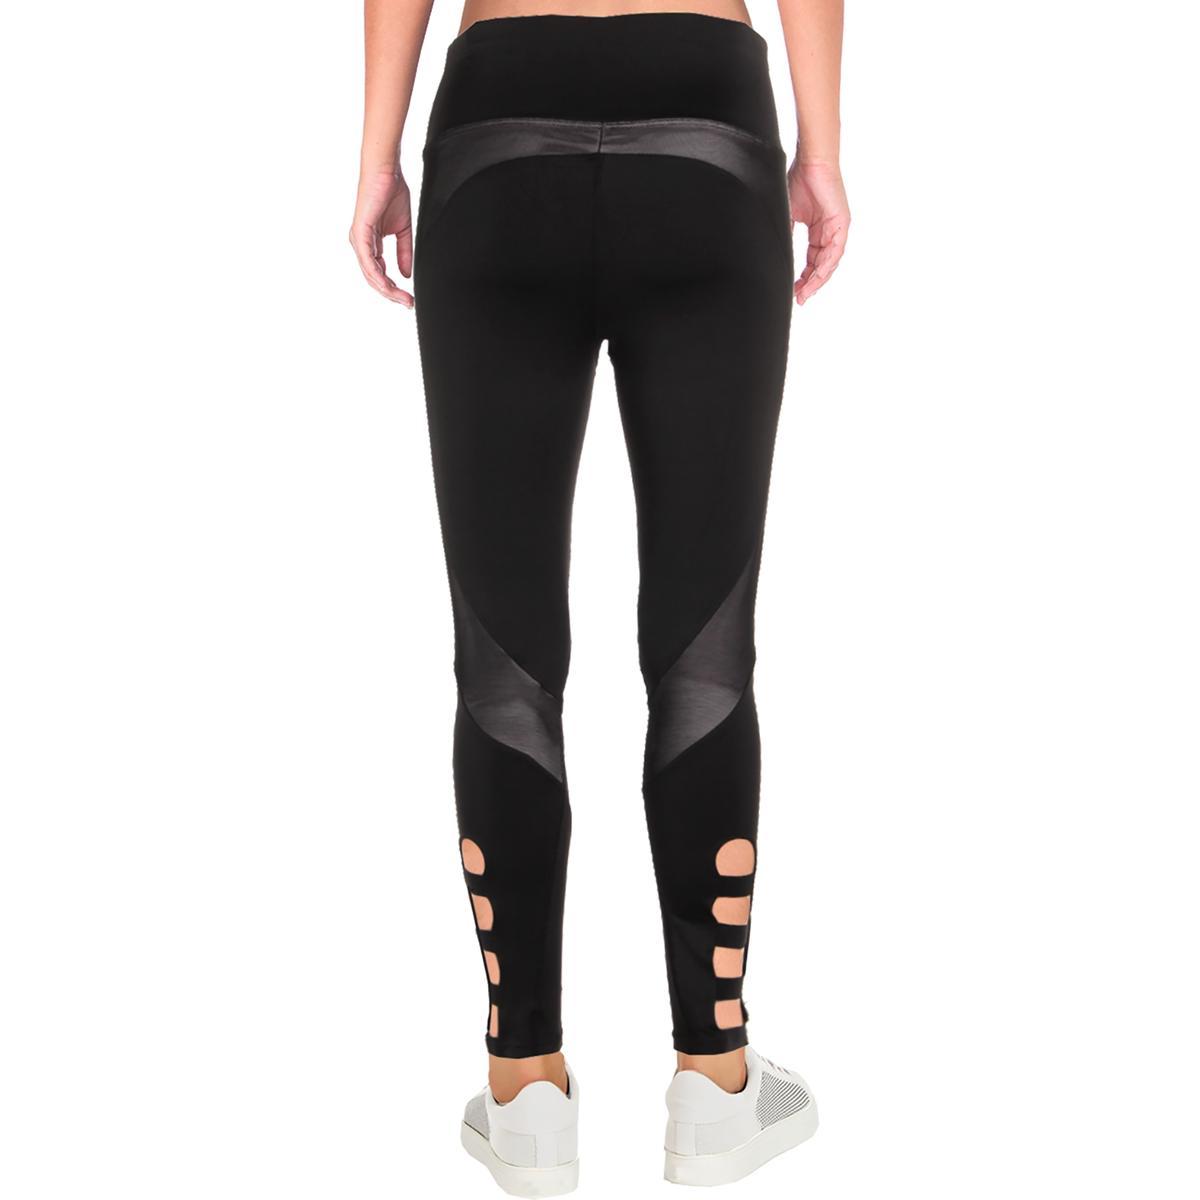 4d9ef4390111f BCBG Max Azria Womens Allegra Black Yoga Fitness Athletic Leggings ...